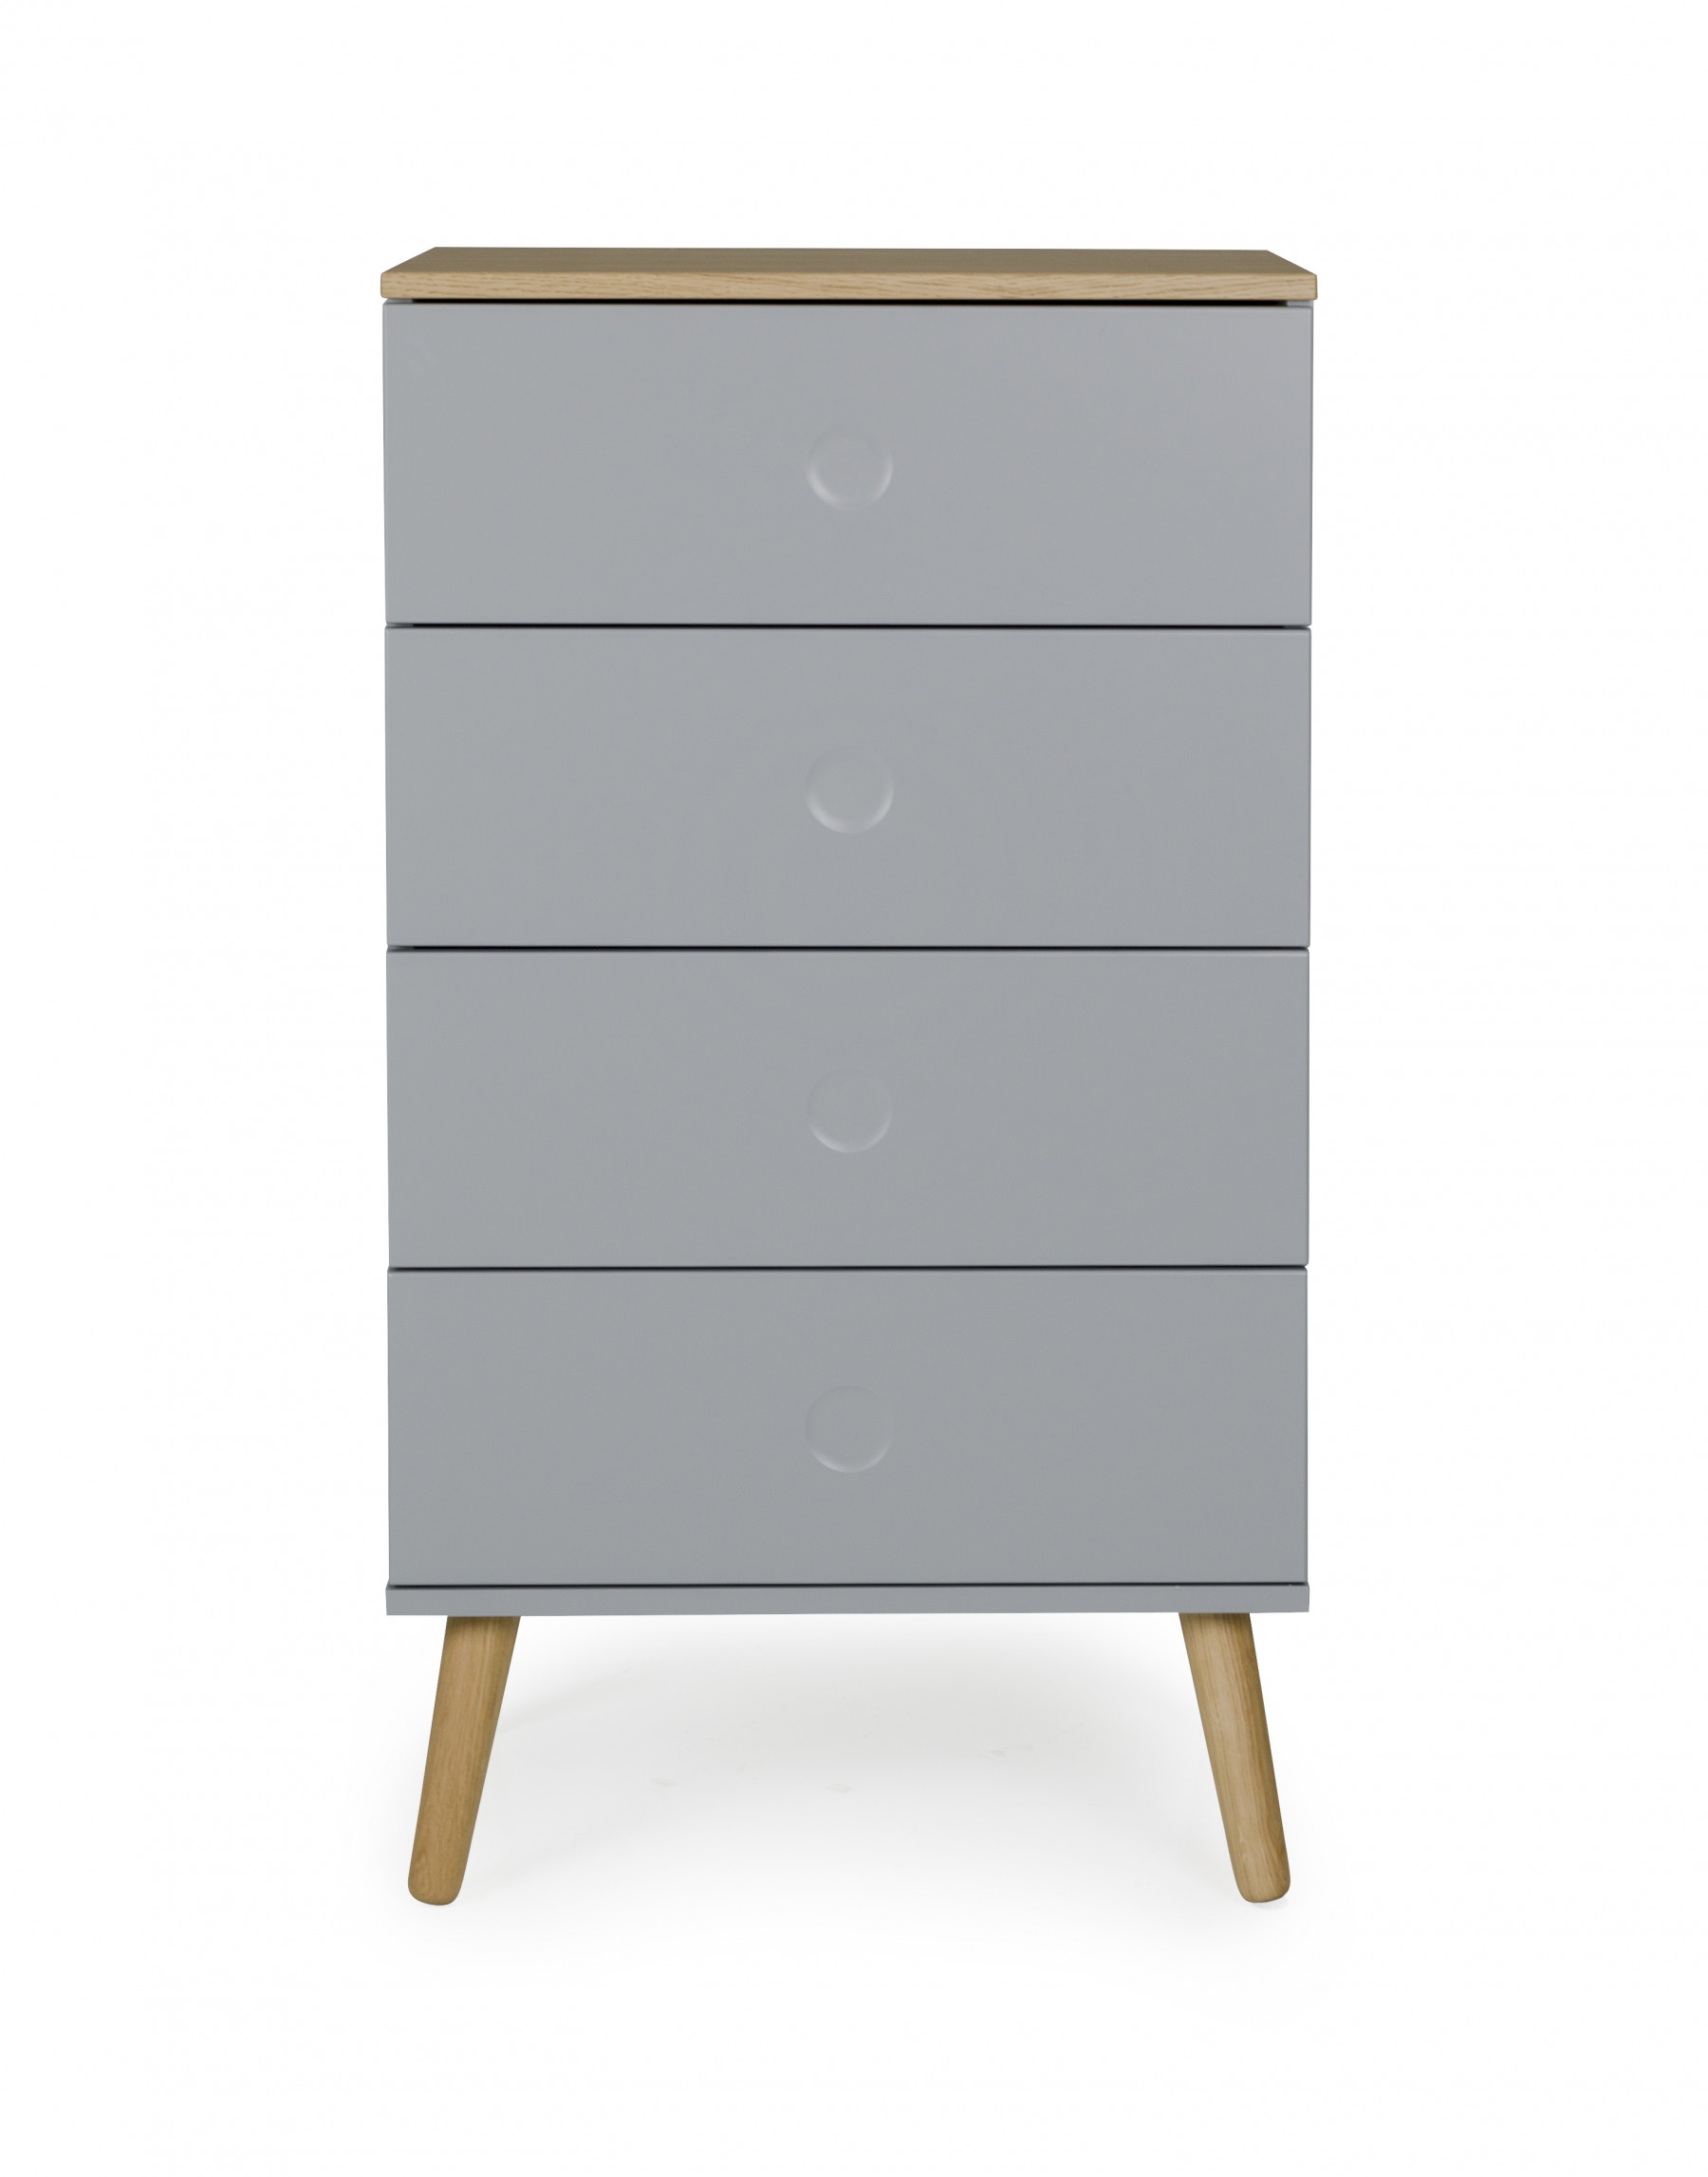 kommode i 55 cm bredde med 4 skuffer topplade og ben i eg. Black Bedroom Furniture Sets. Home Design Ideas